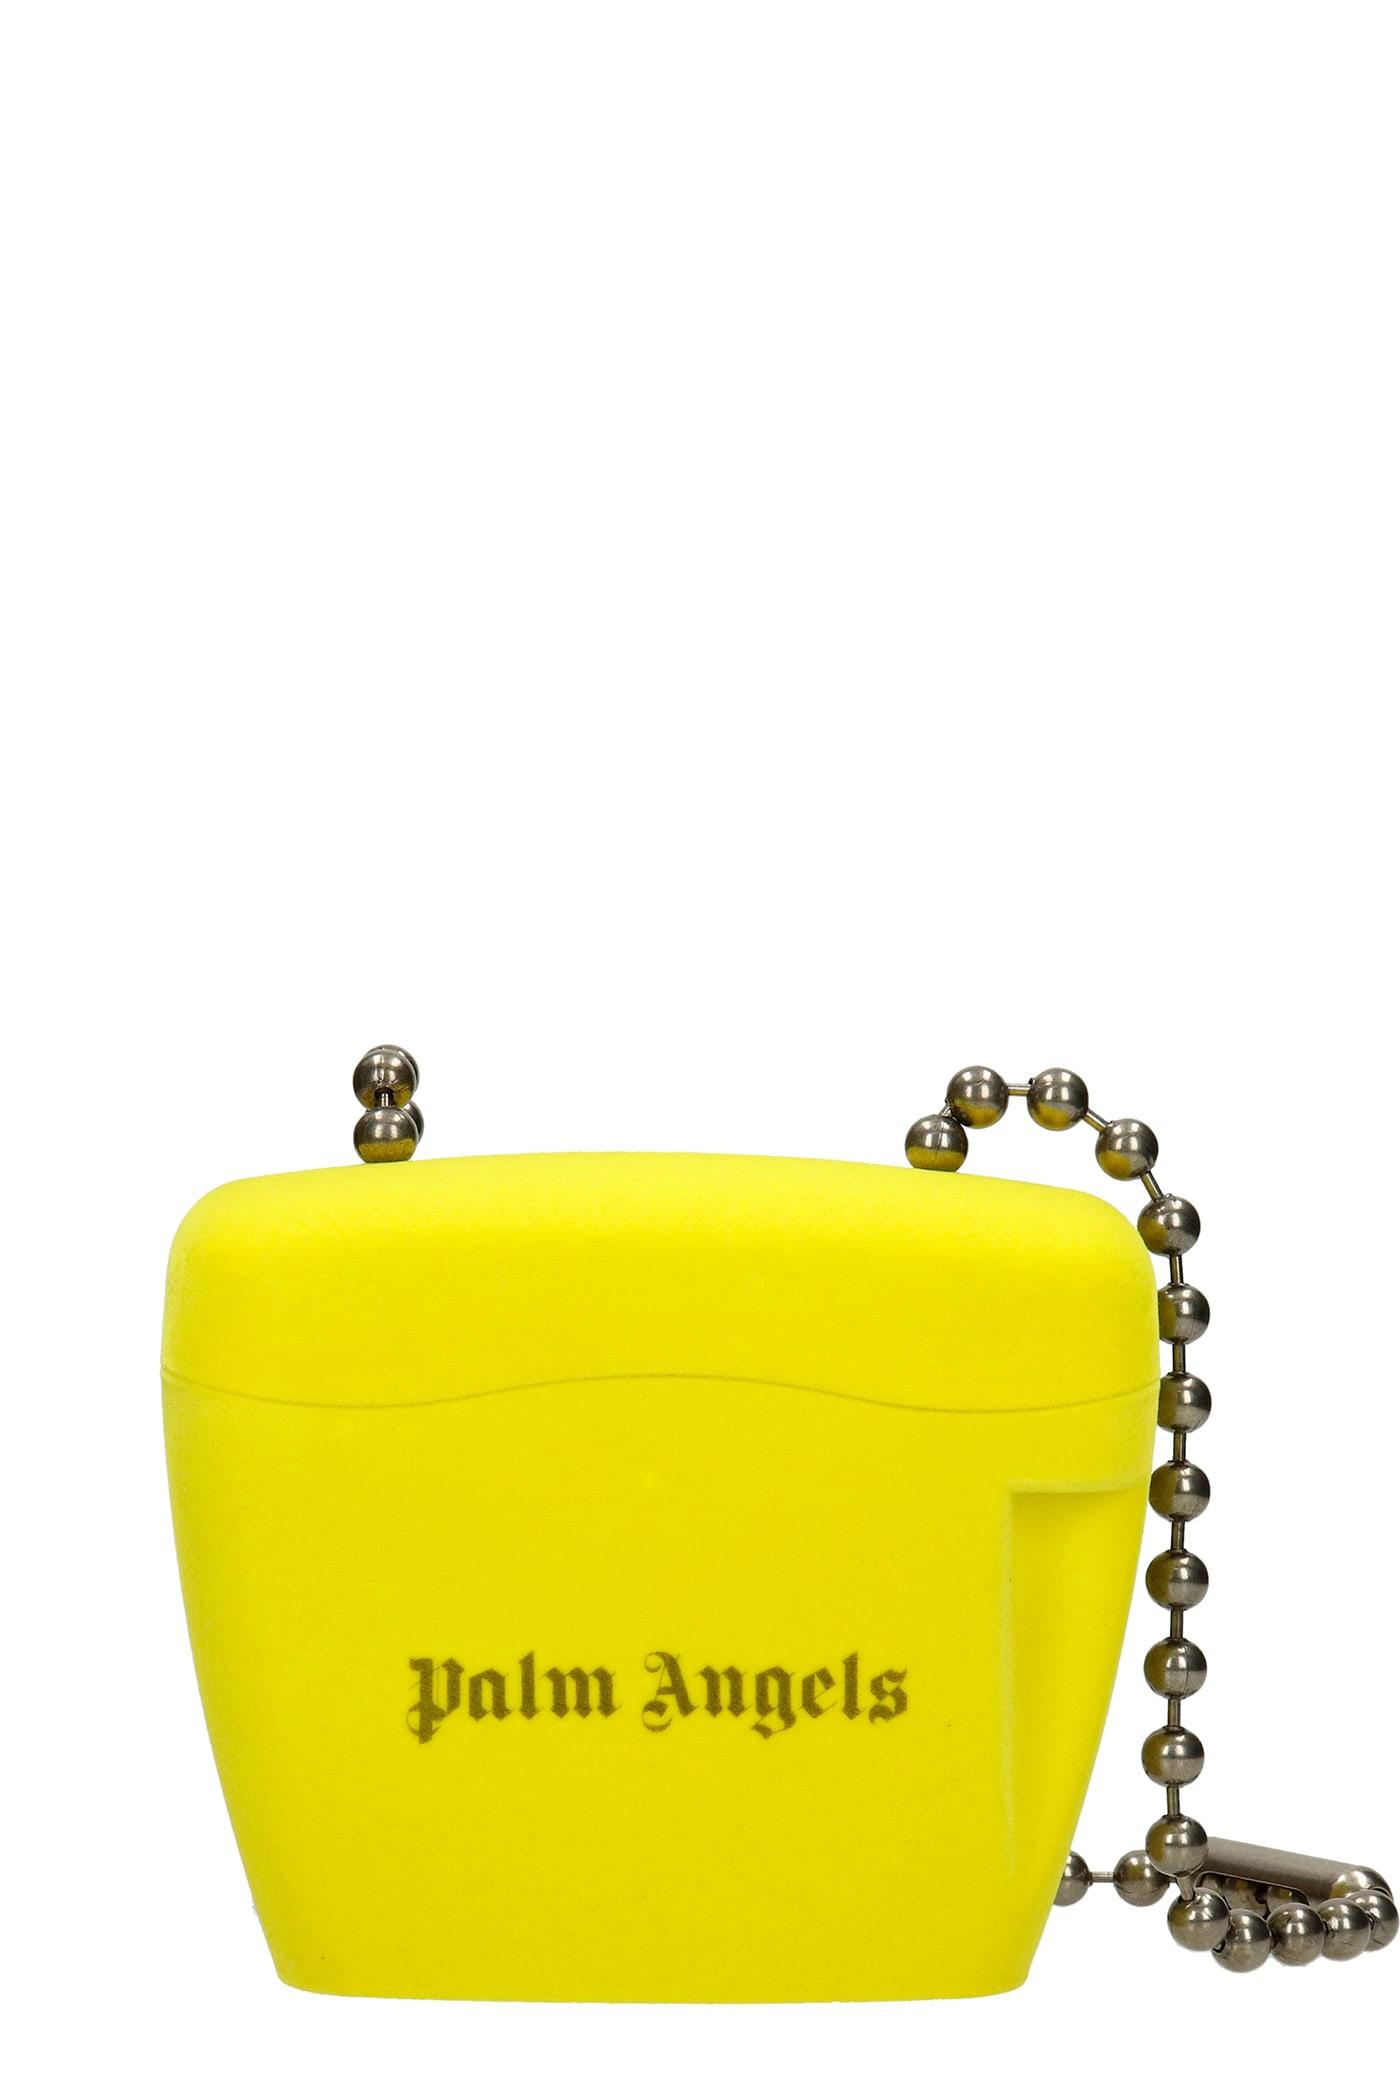 Palm Angels Shoulder Bag In Yellow Polypropylene